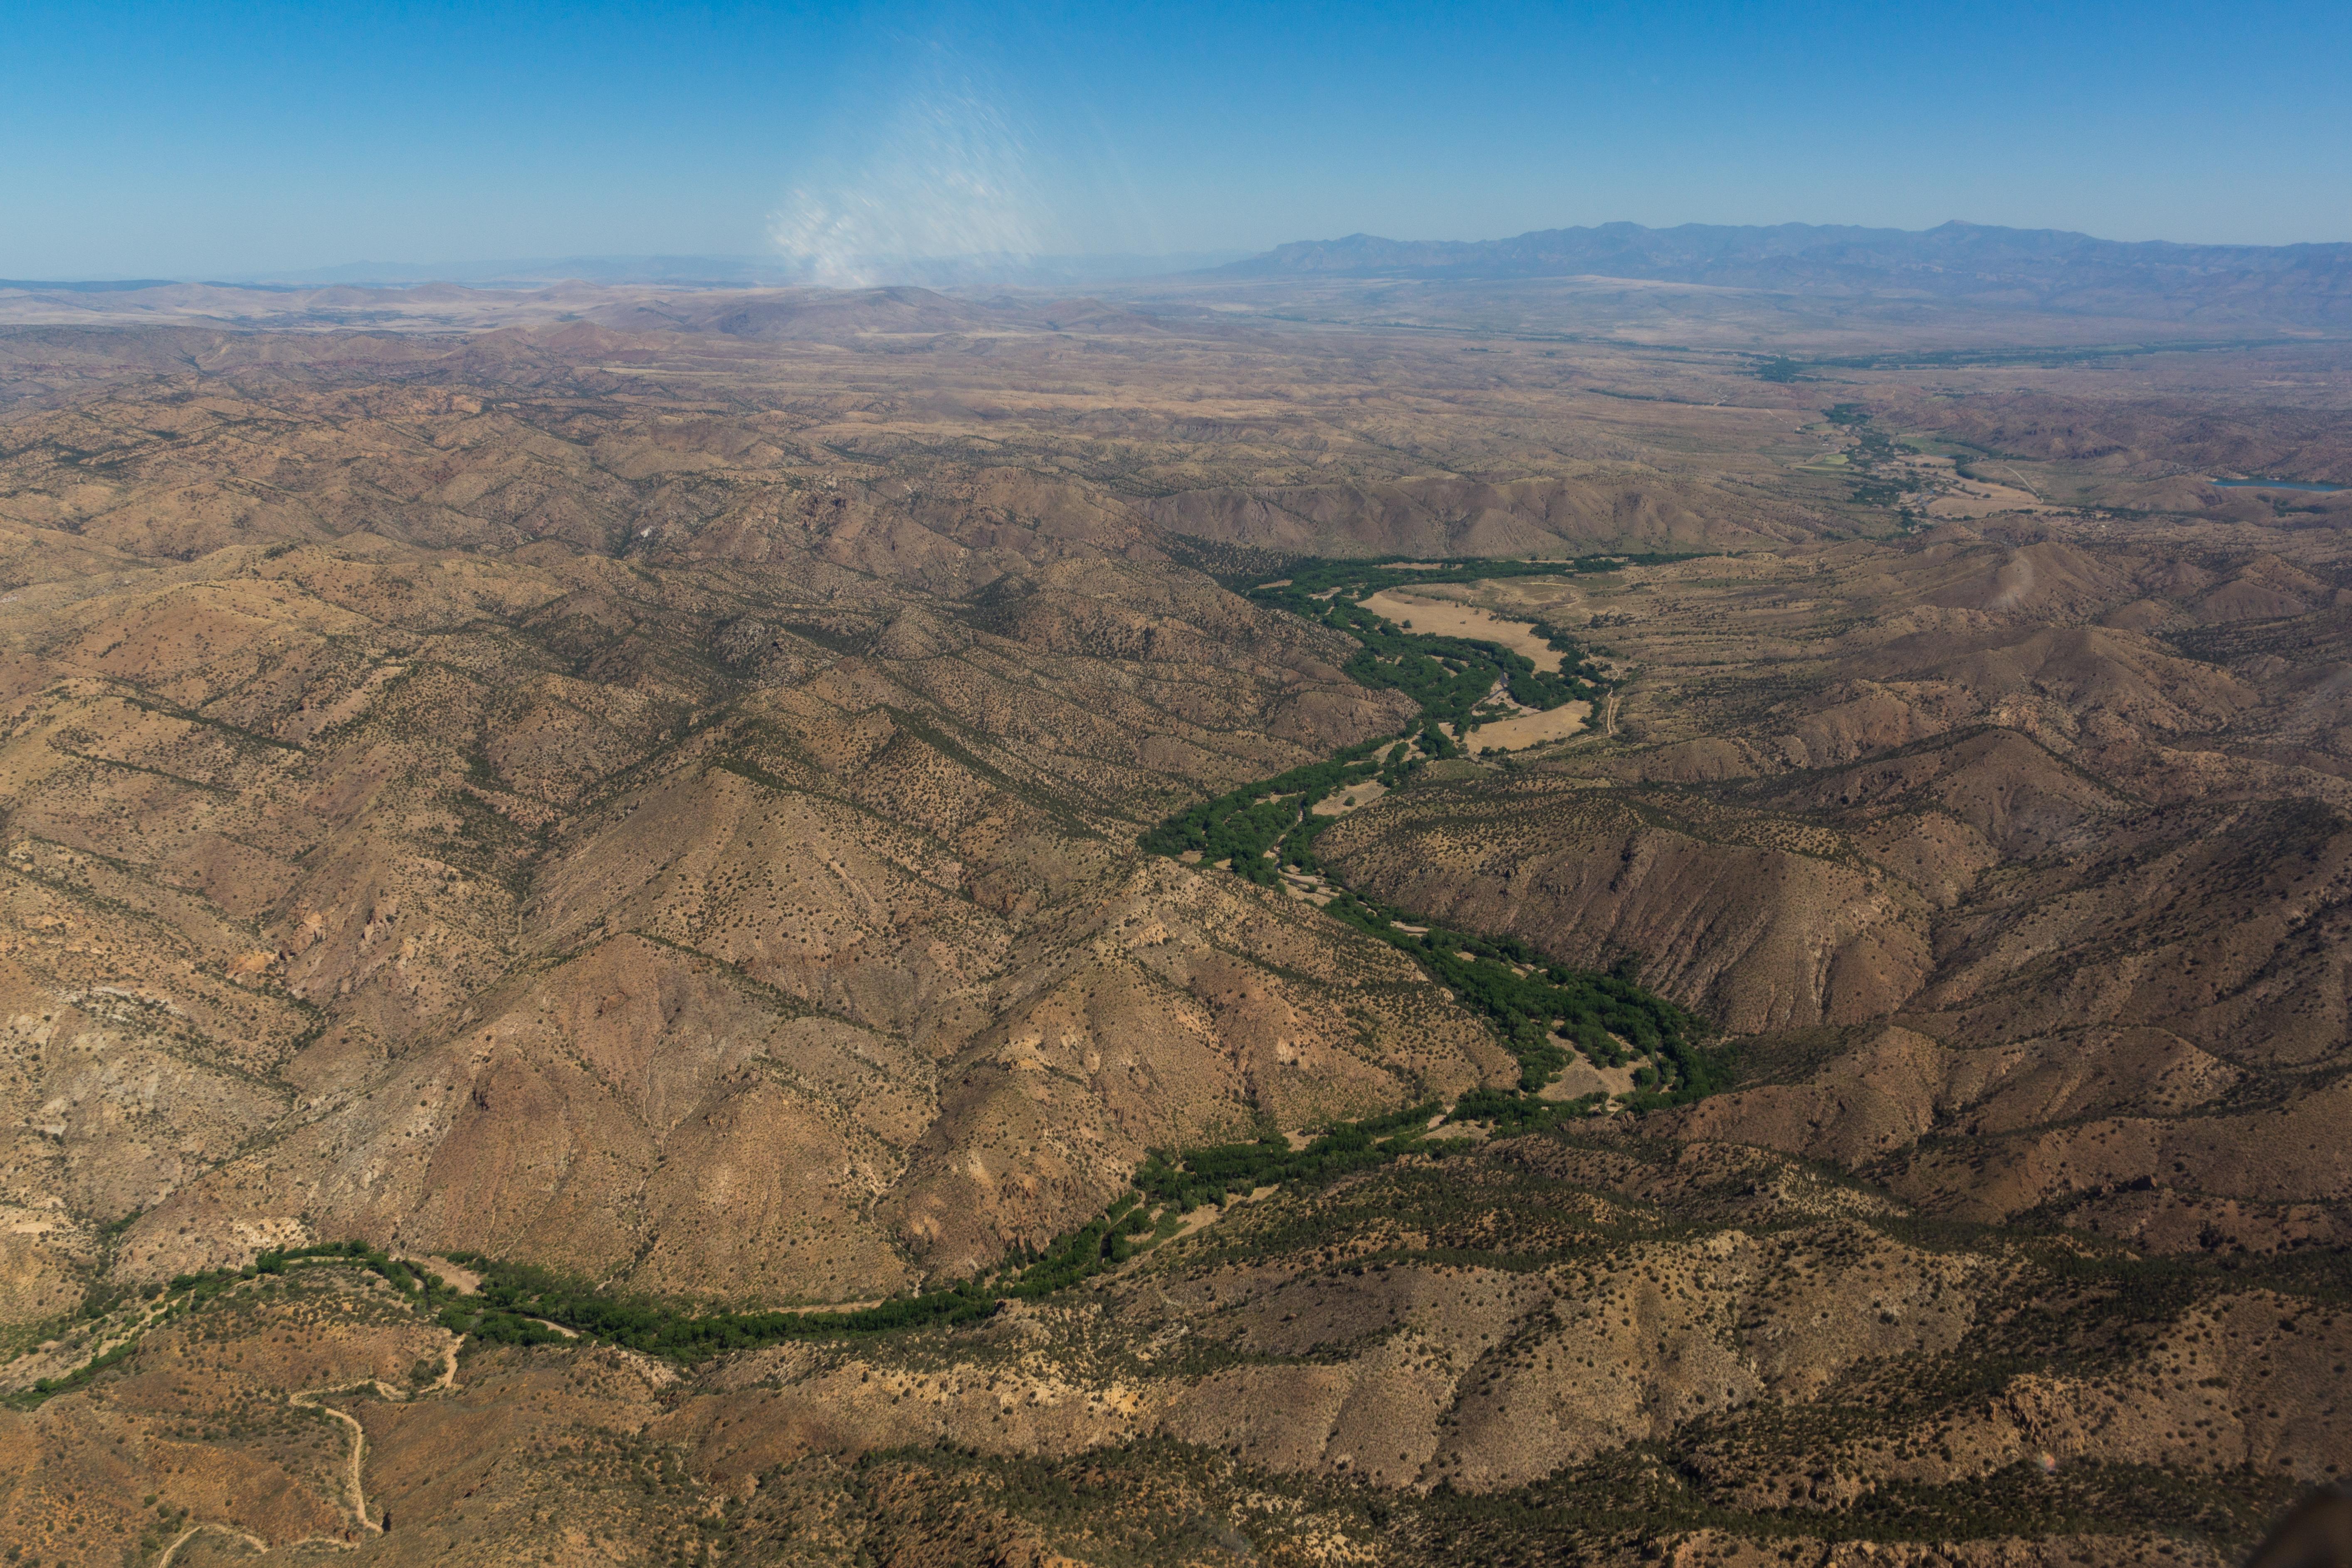 The Gila River in New Mexico. EcoFlight